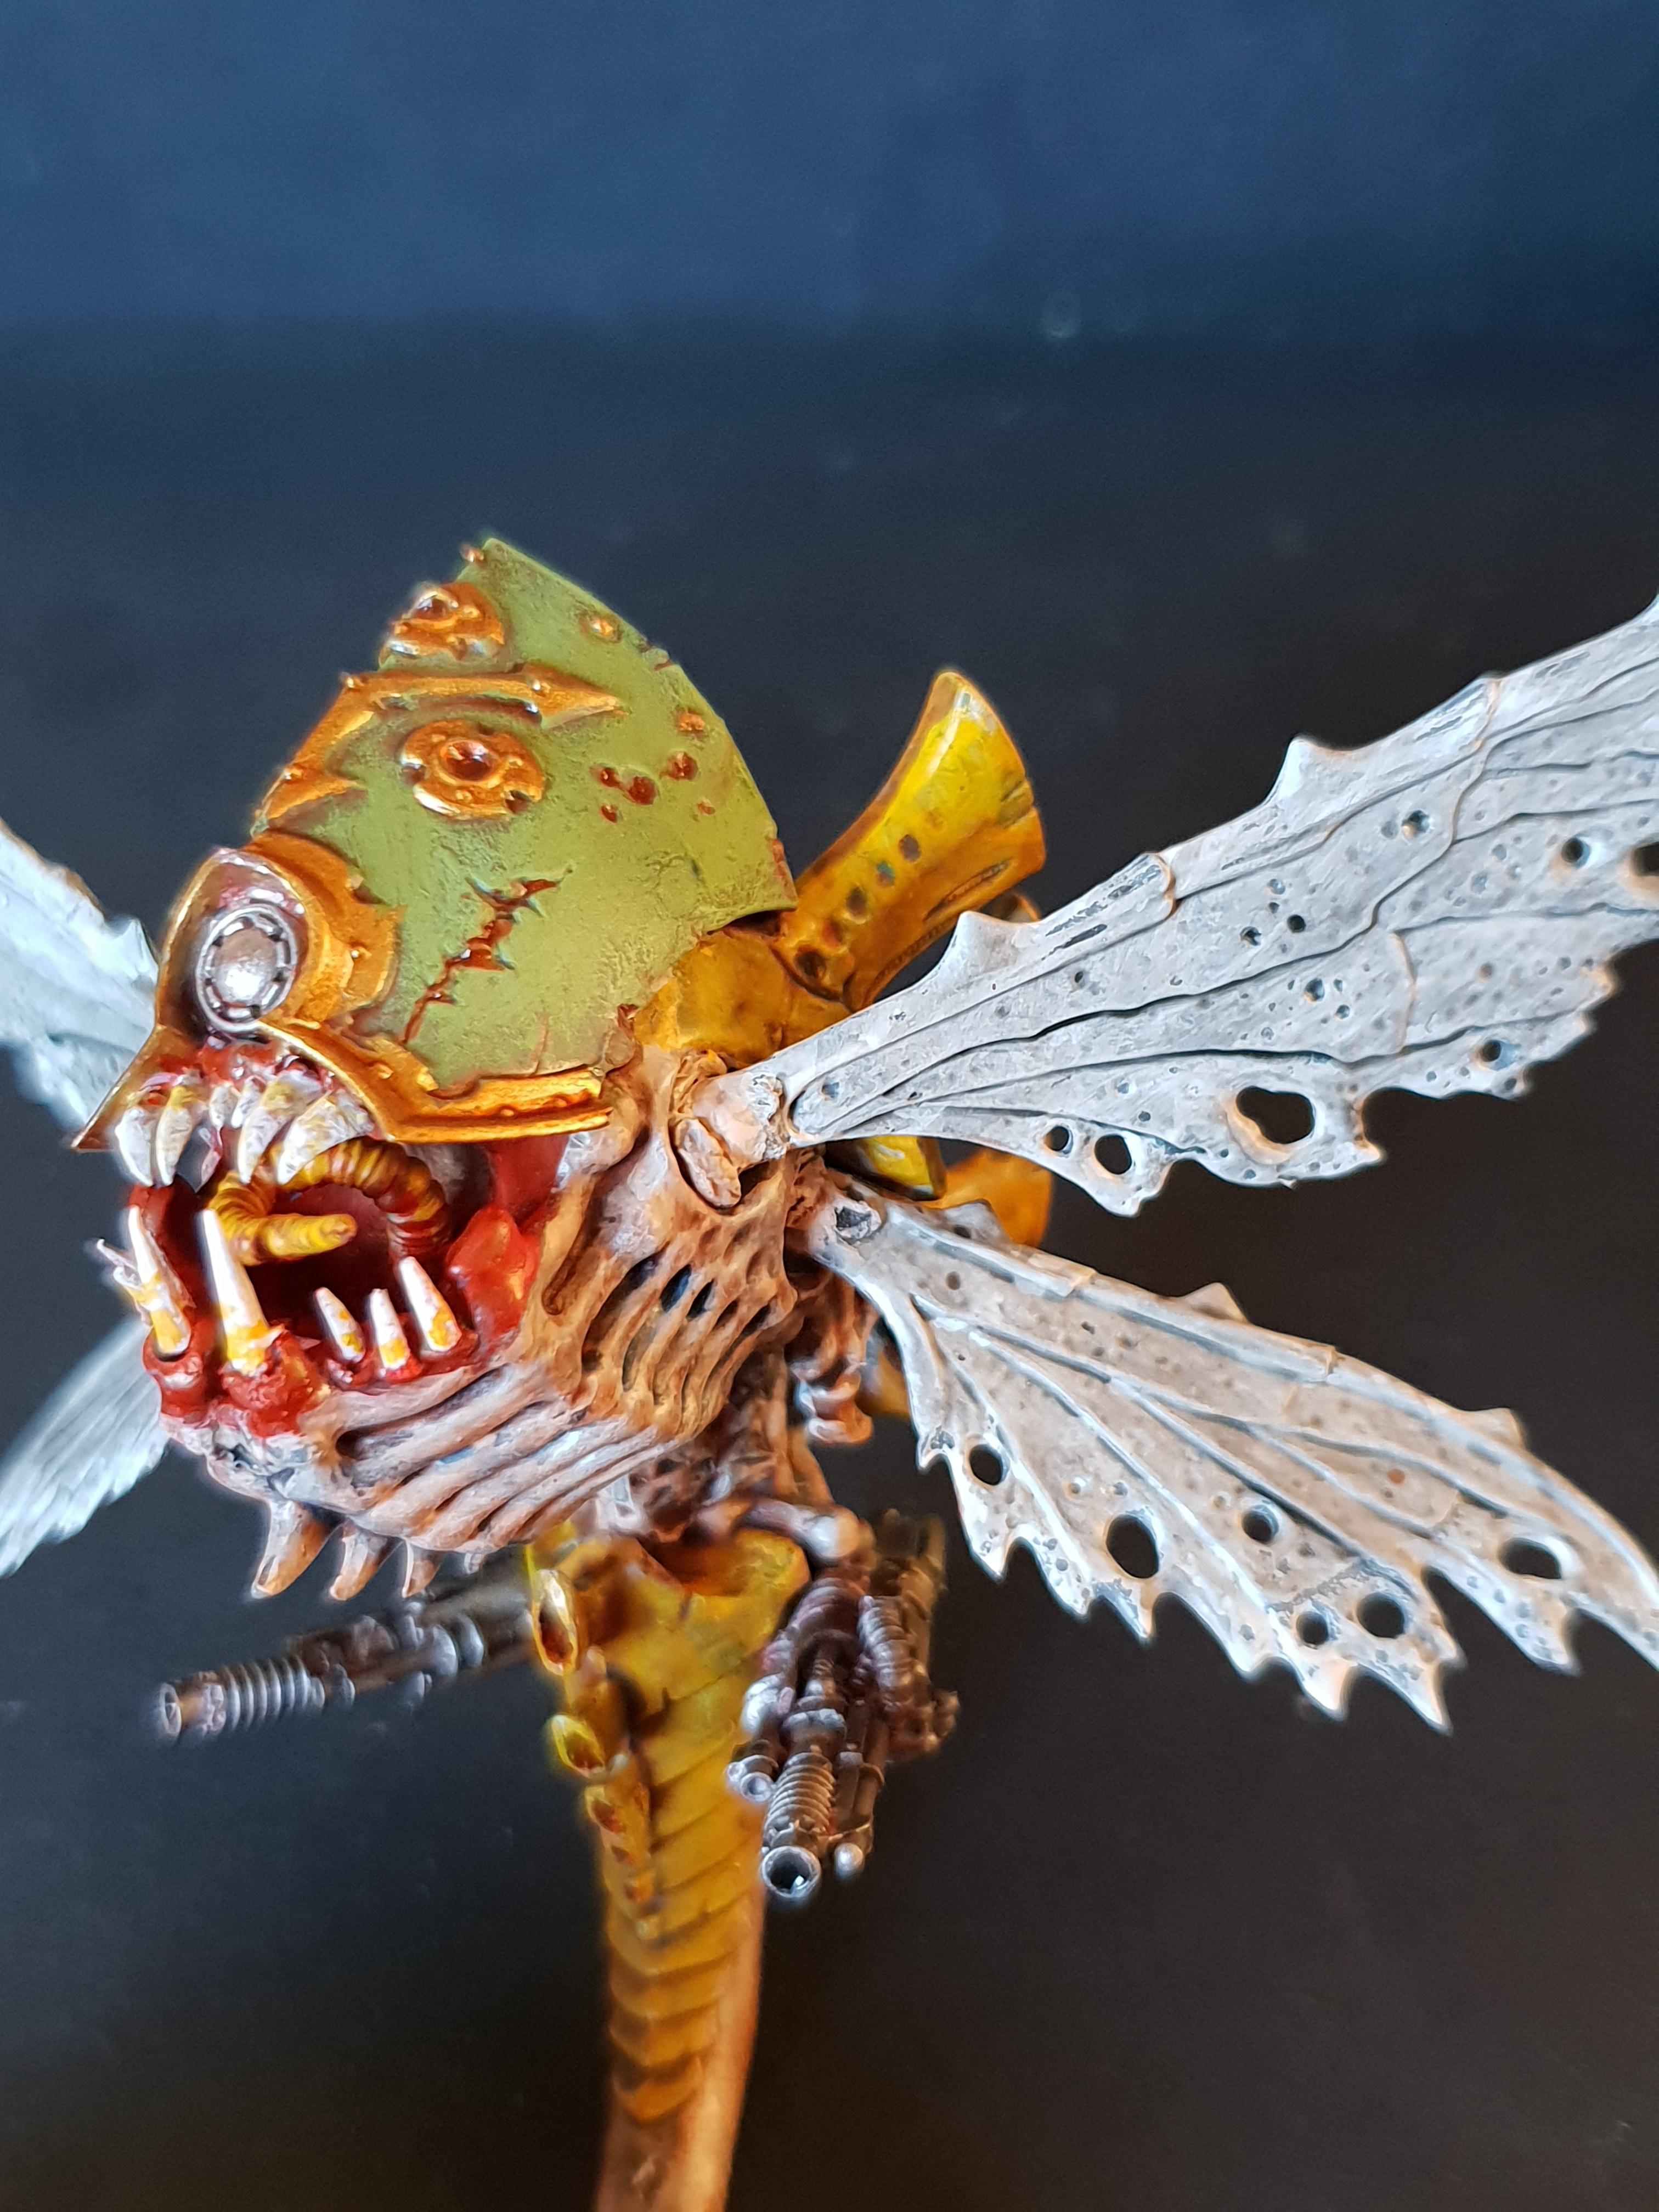 Chaos, Conversion, Drone, Nurgle, Pip, Warhammer 40,000, Work In Progress